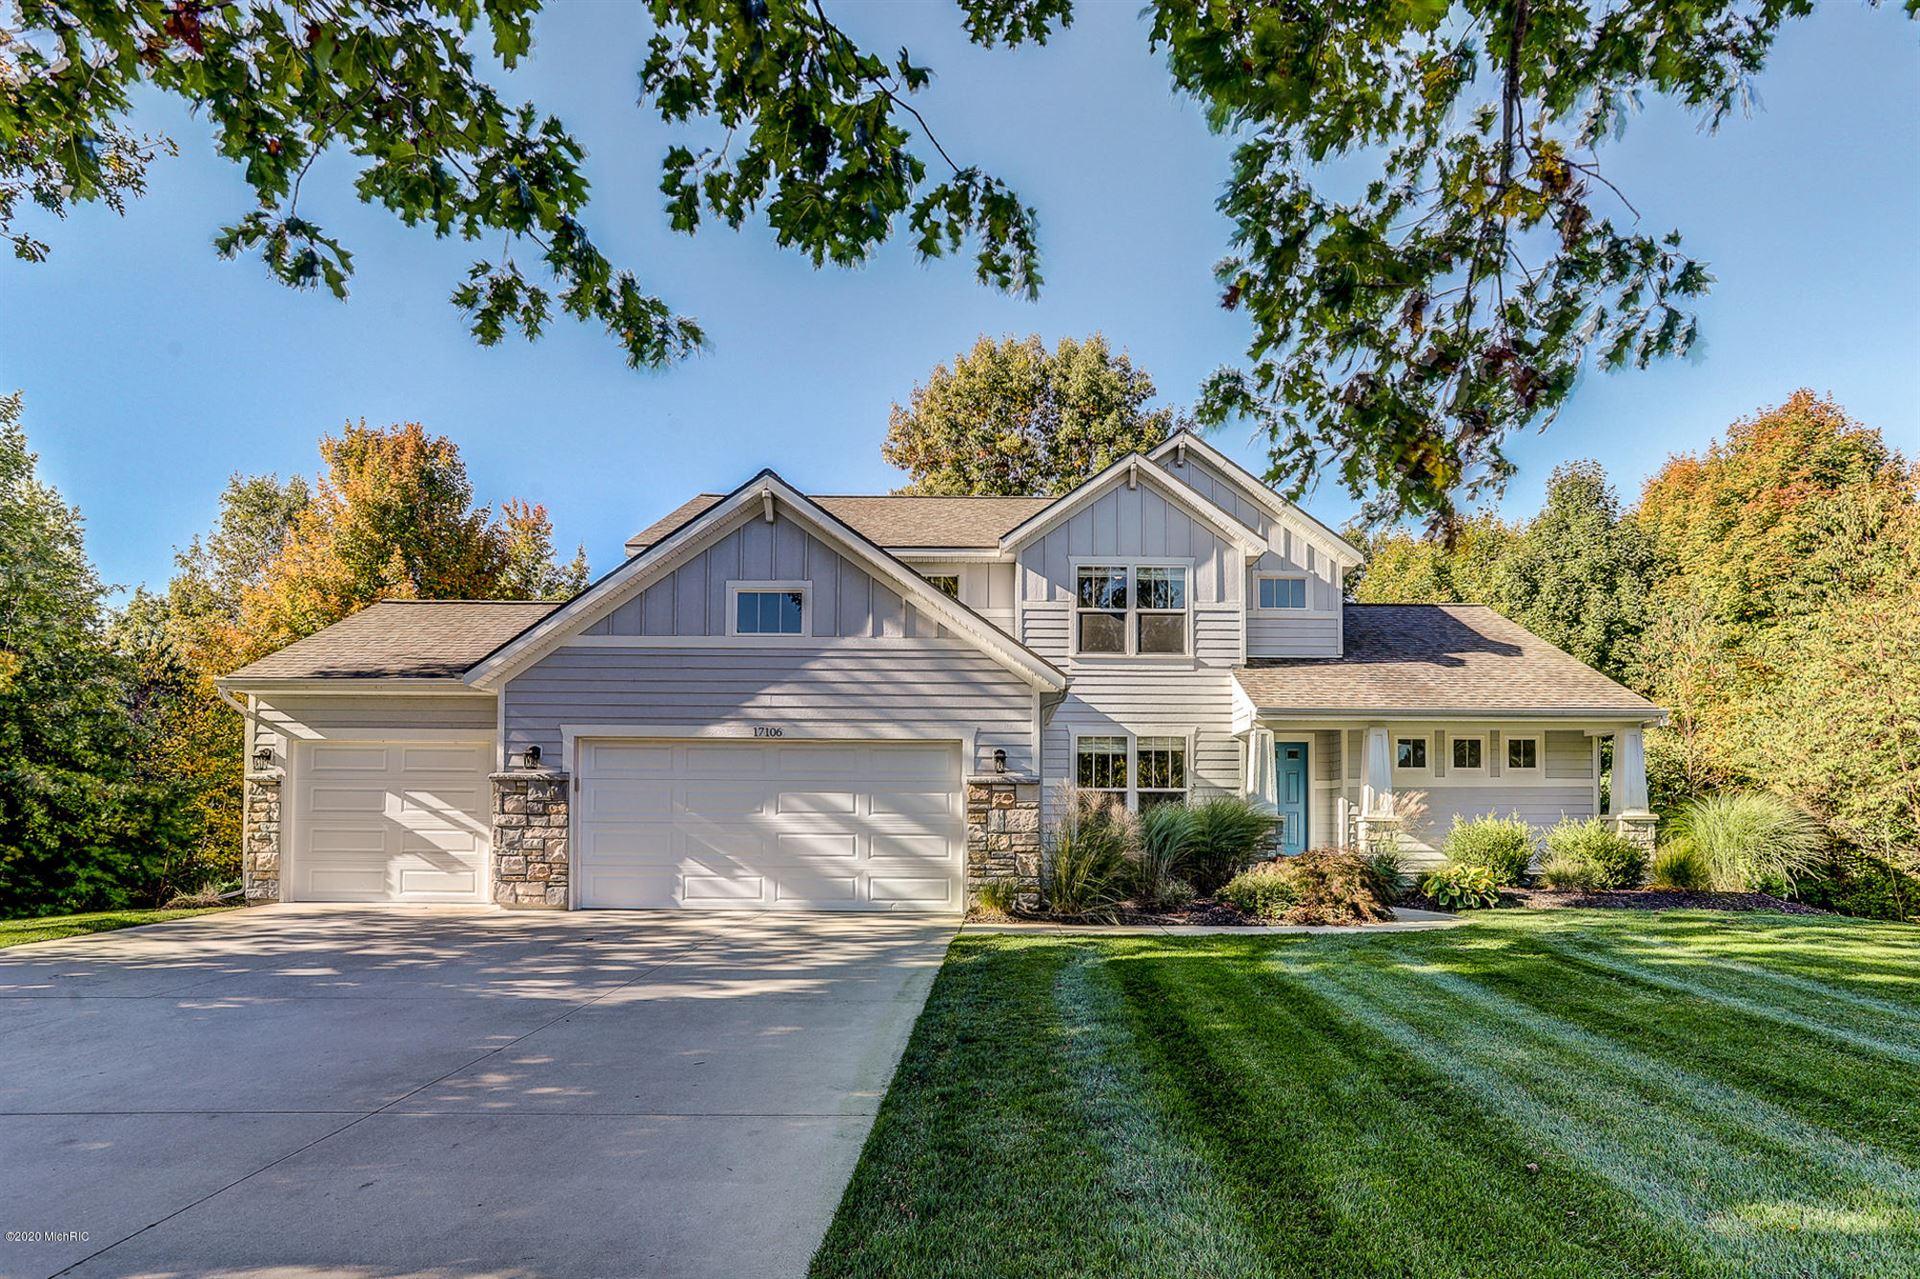 17106 Mapleridge Drive, West Olive, MI 49460 - MLS#: 20042907